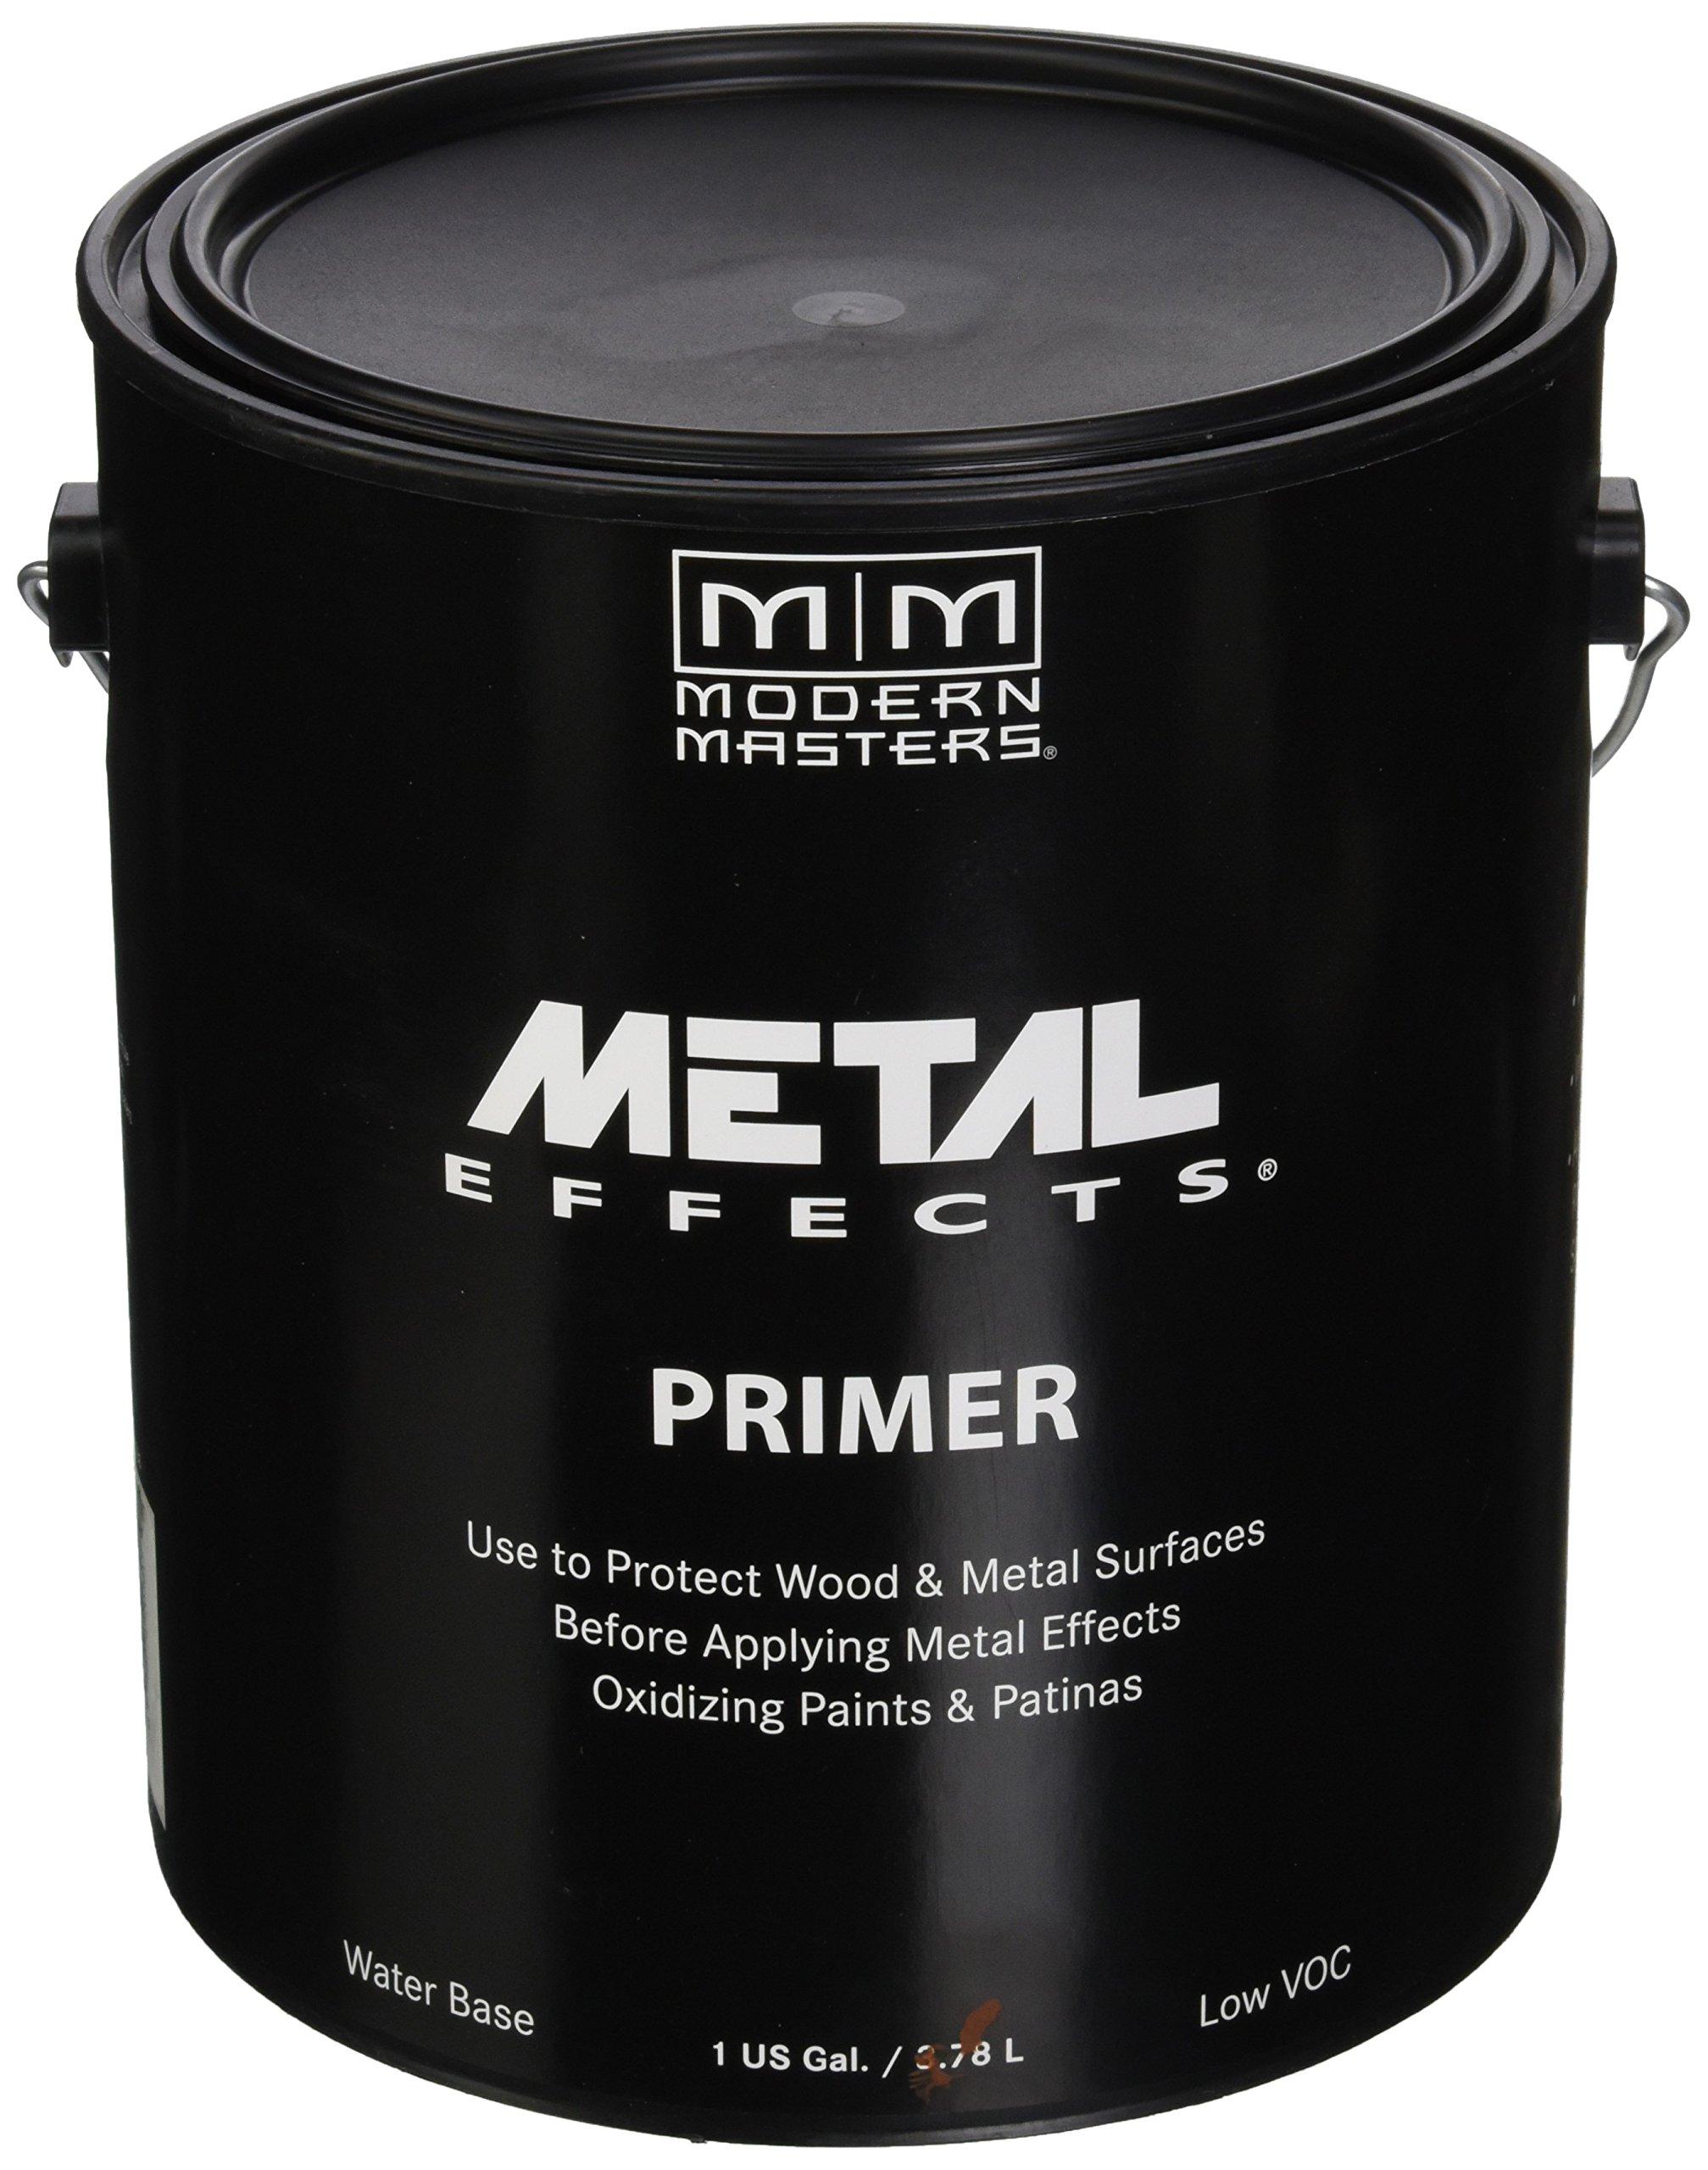 Modern 151021 AM203-GAL Metal Effects Primer, 1 gallon